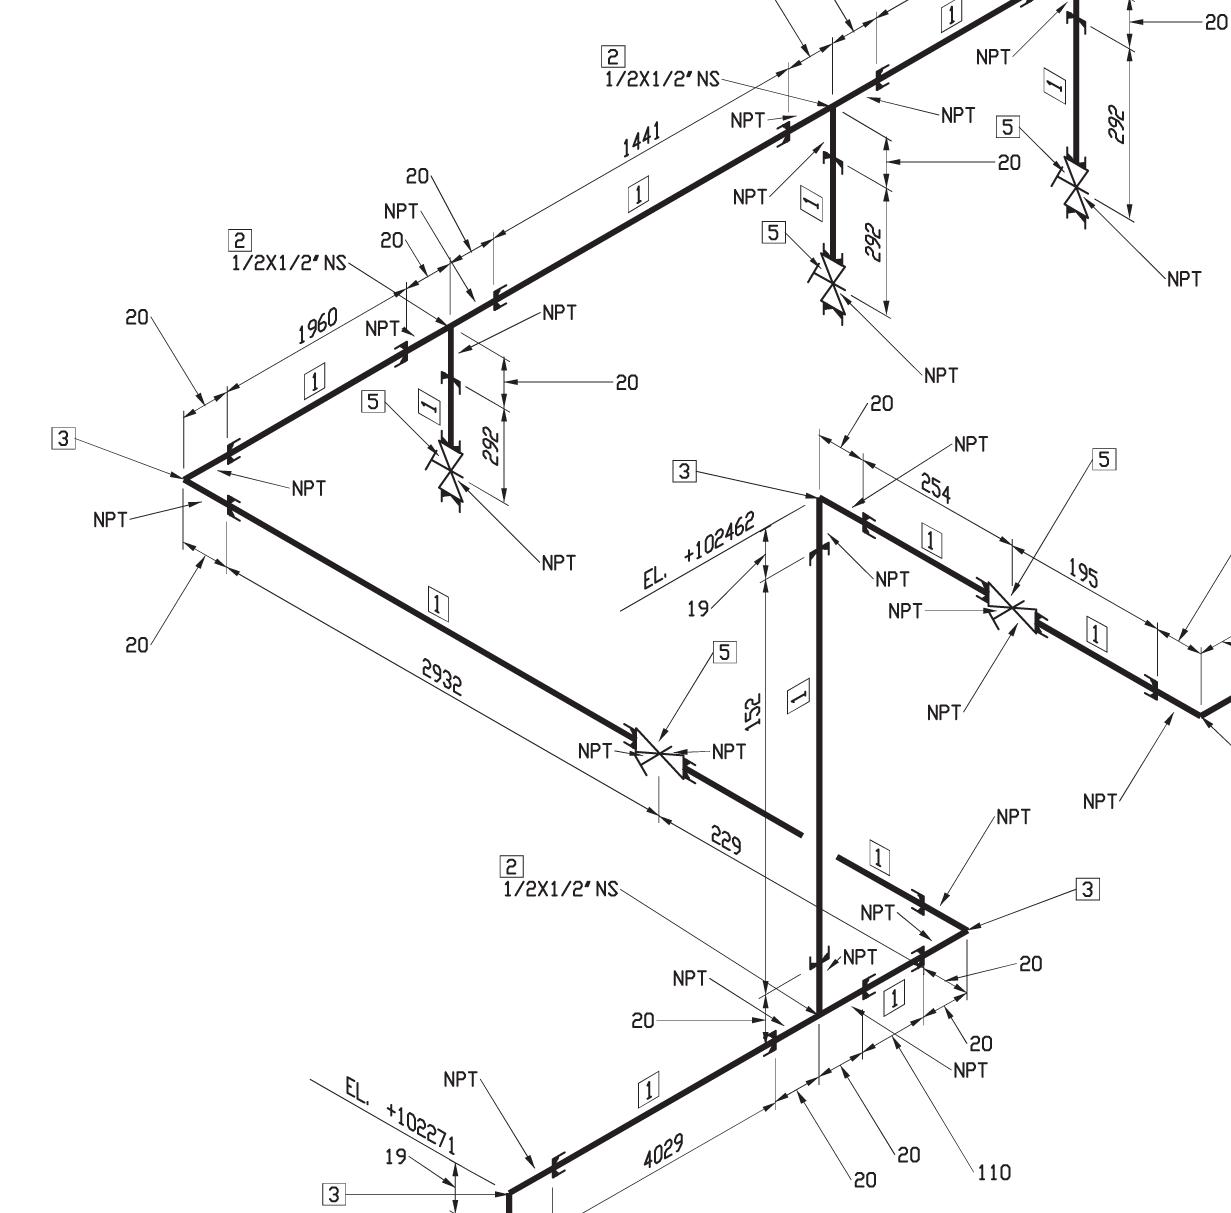 Digestive System Diagram Simple also DARKLIGHT SENSOR BASED ON The LM741 Op as well Diagrama Cummins besides Progettazione Impianti Meccanici additionally Malpresentations And Malpositions. on schematic presentation